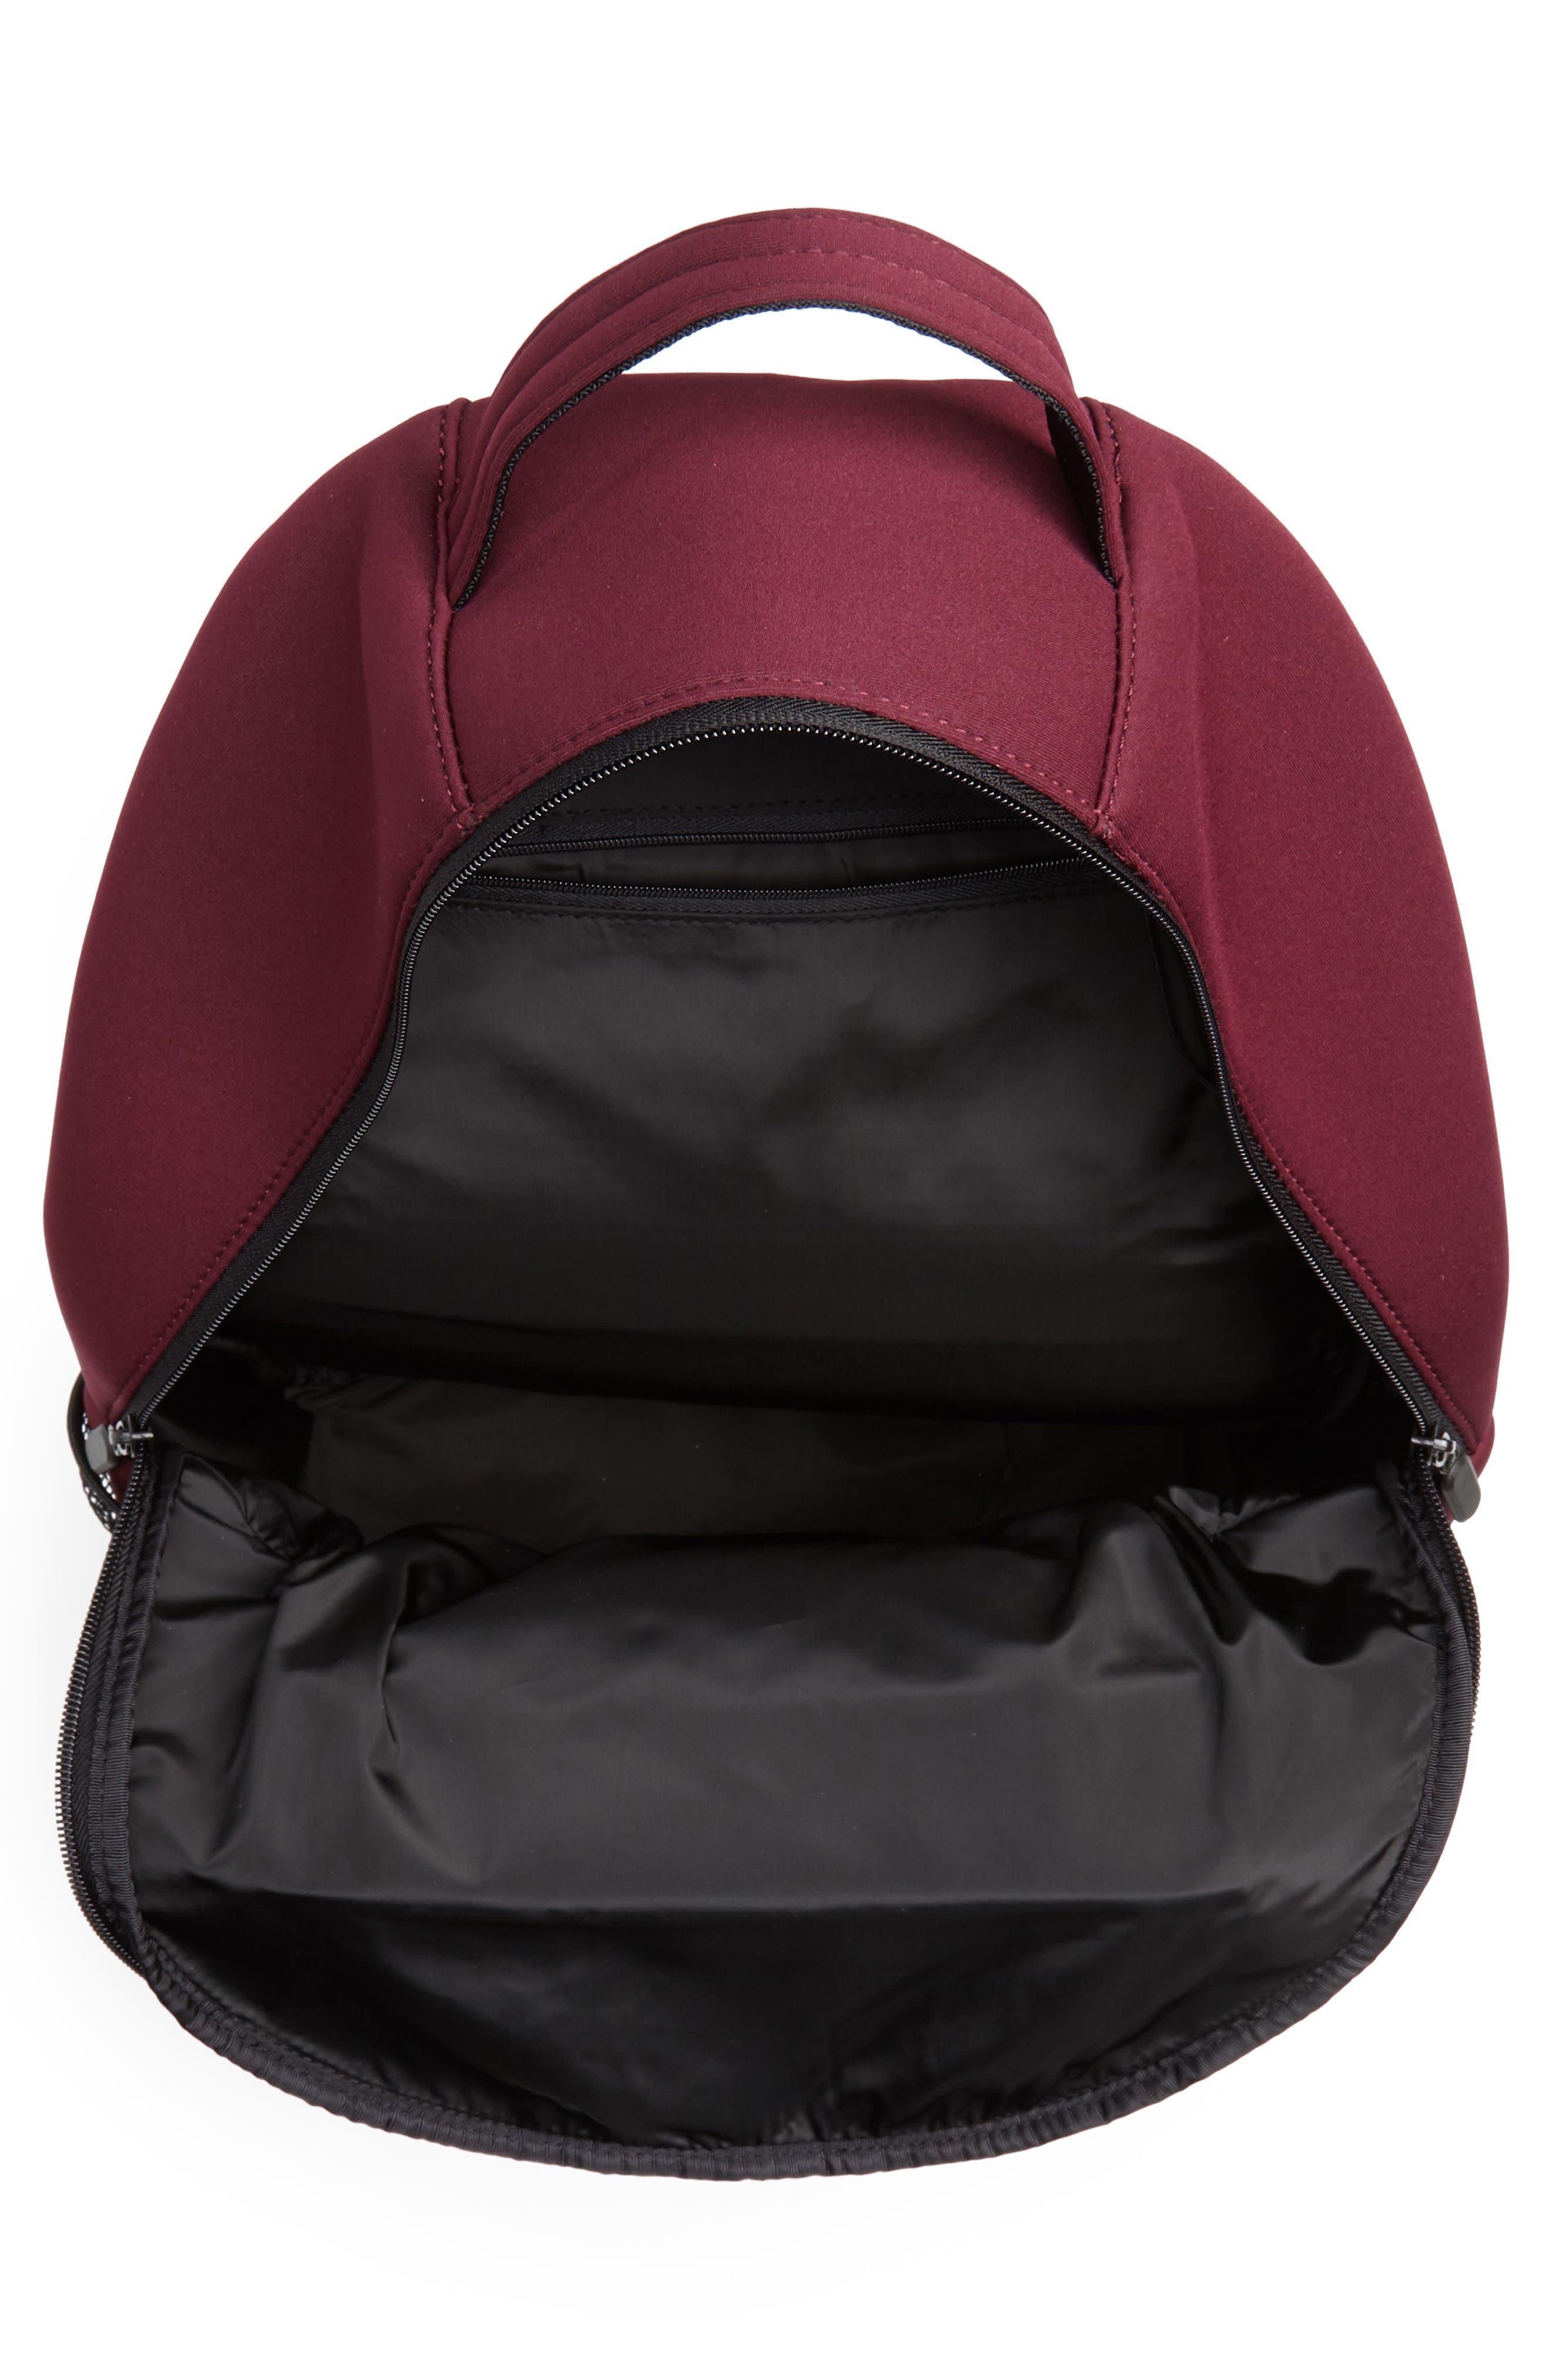 Baseline Backpack,                             Alternate thumbnail 4, color,                             RED TANNIN